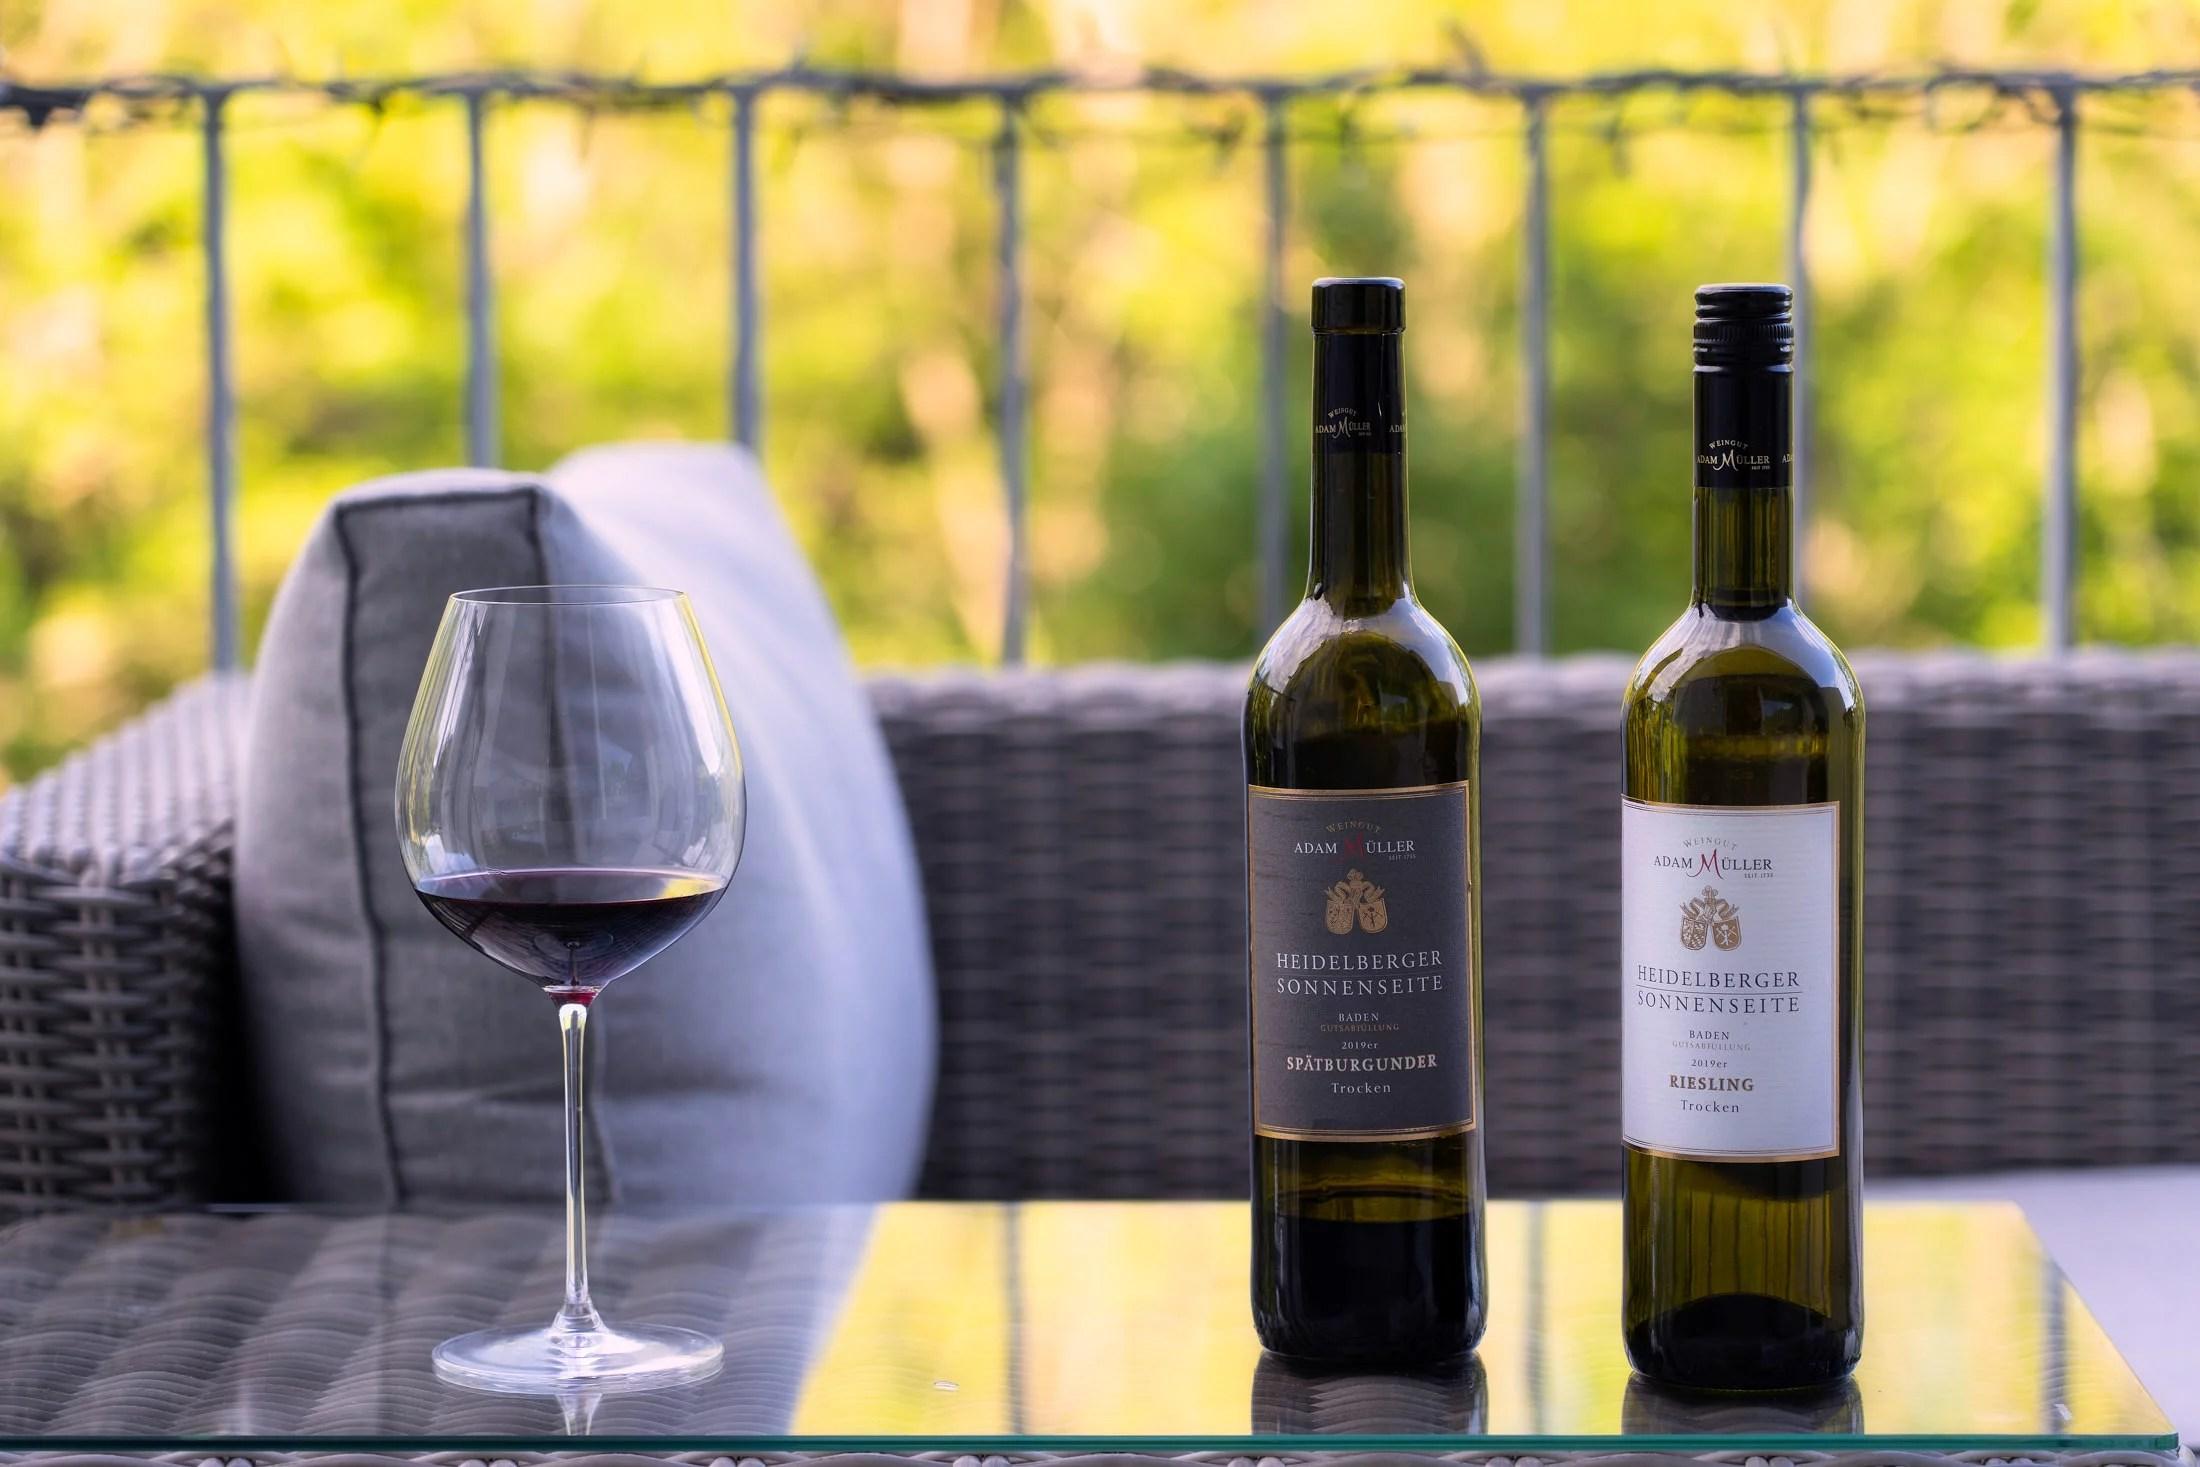 Два короля немецких вин - Шпетбургундер (он же Пино-нуар) и Рислинг